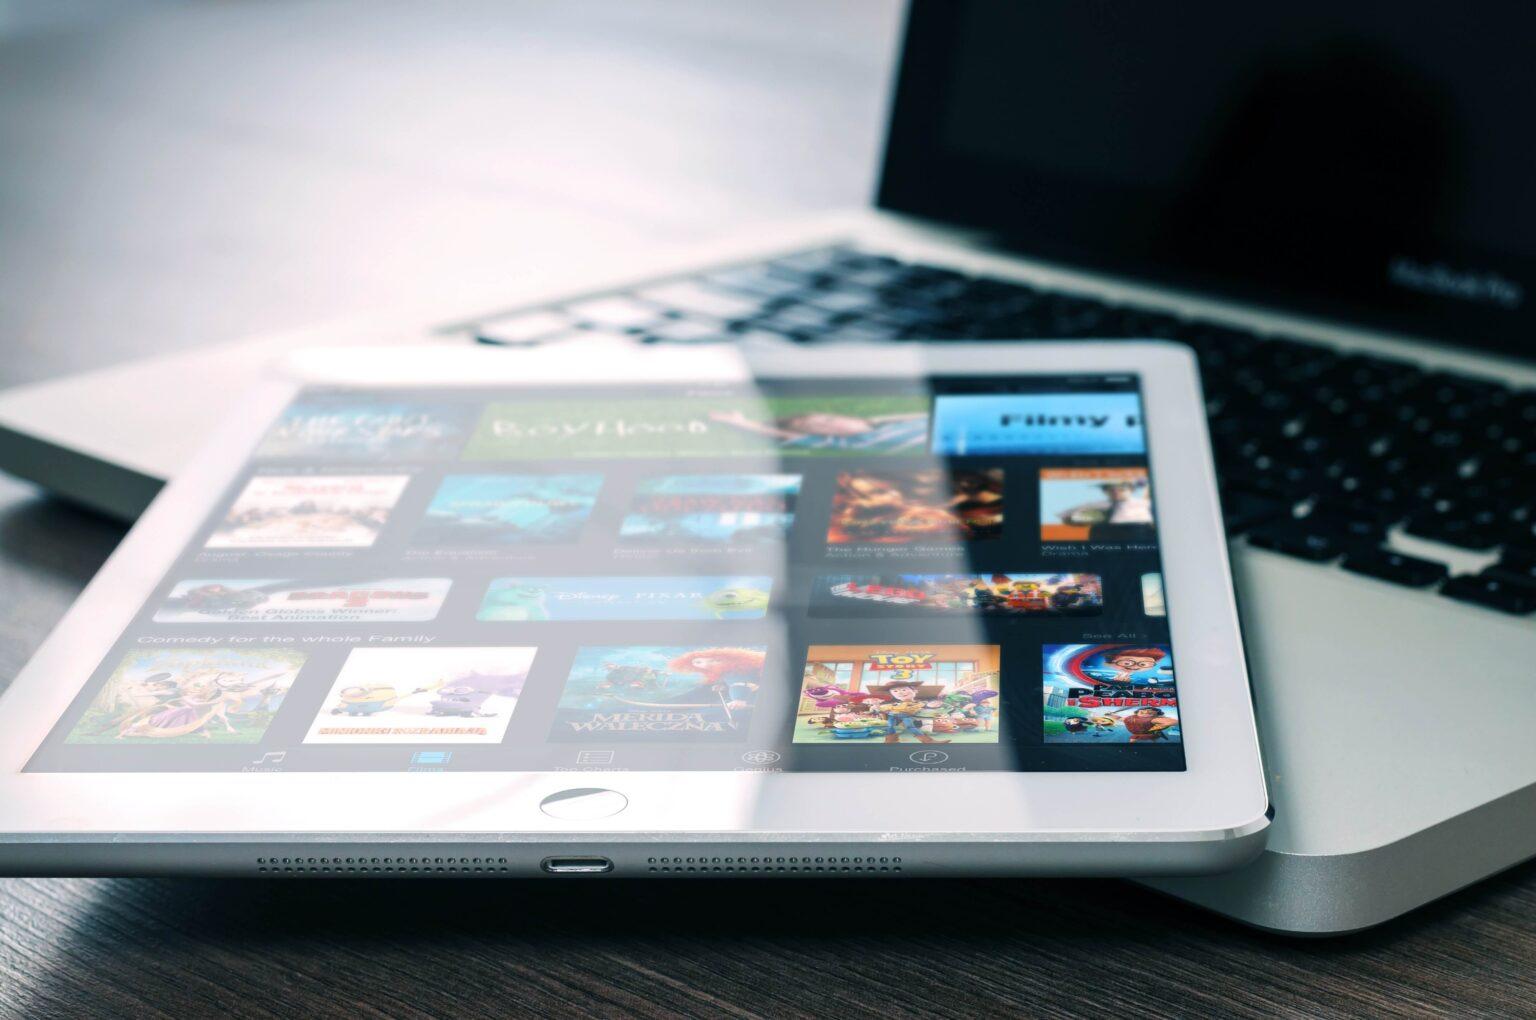 9 Best Tablets for Emulation: Buyer's Guide